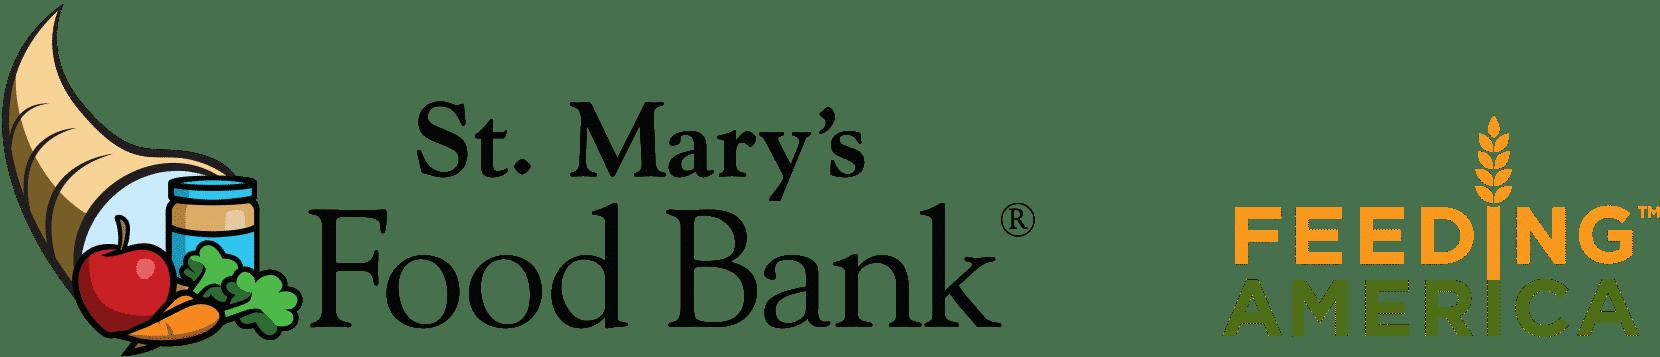 St Mary's Food Bank - Feeding America